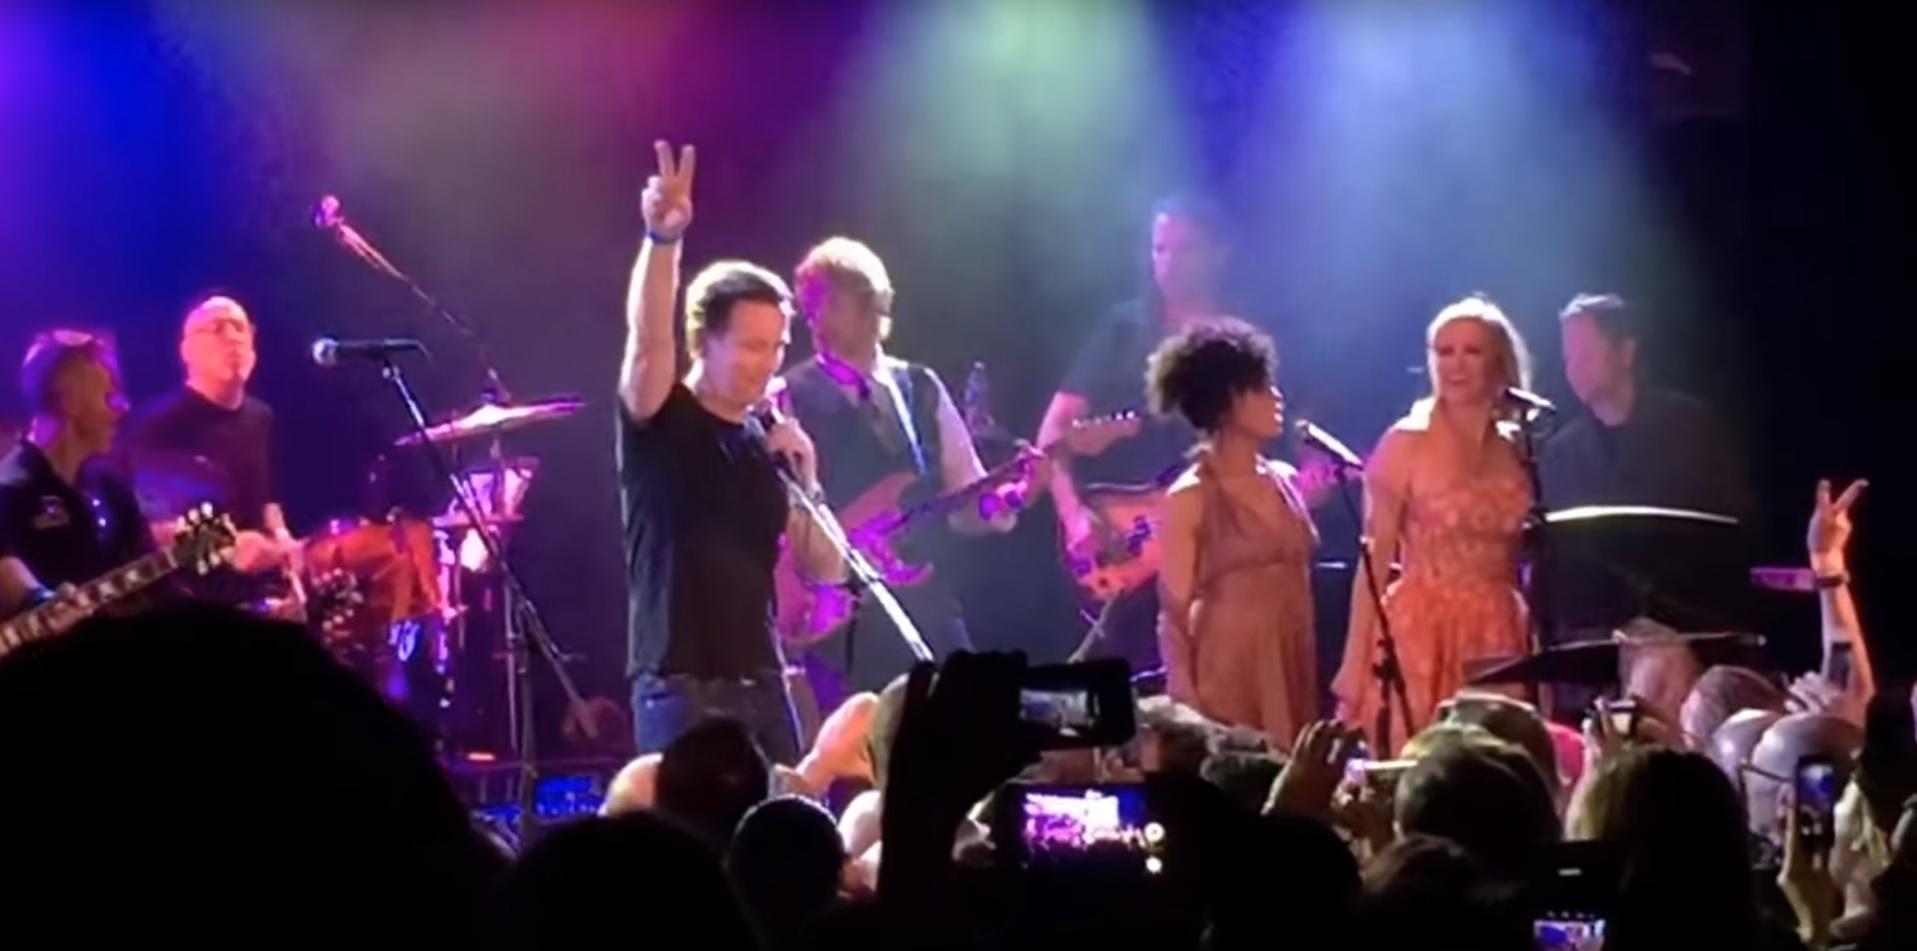 Ewan McGregor and Gary Oldman perform at David Bowie tribute concert